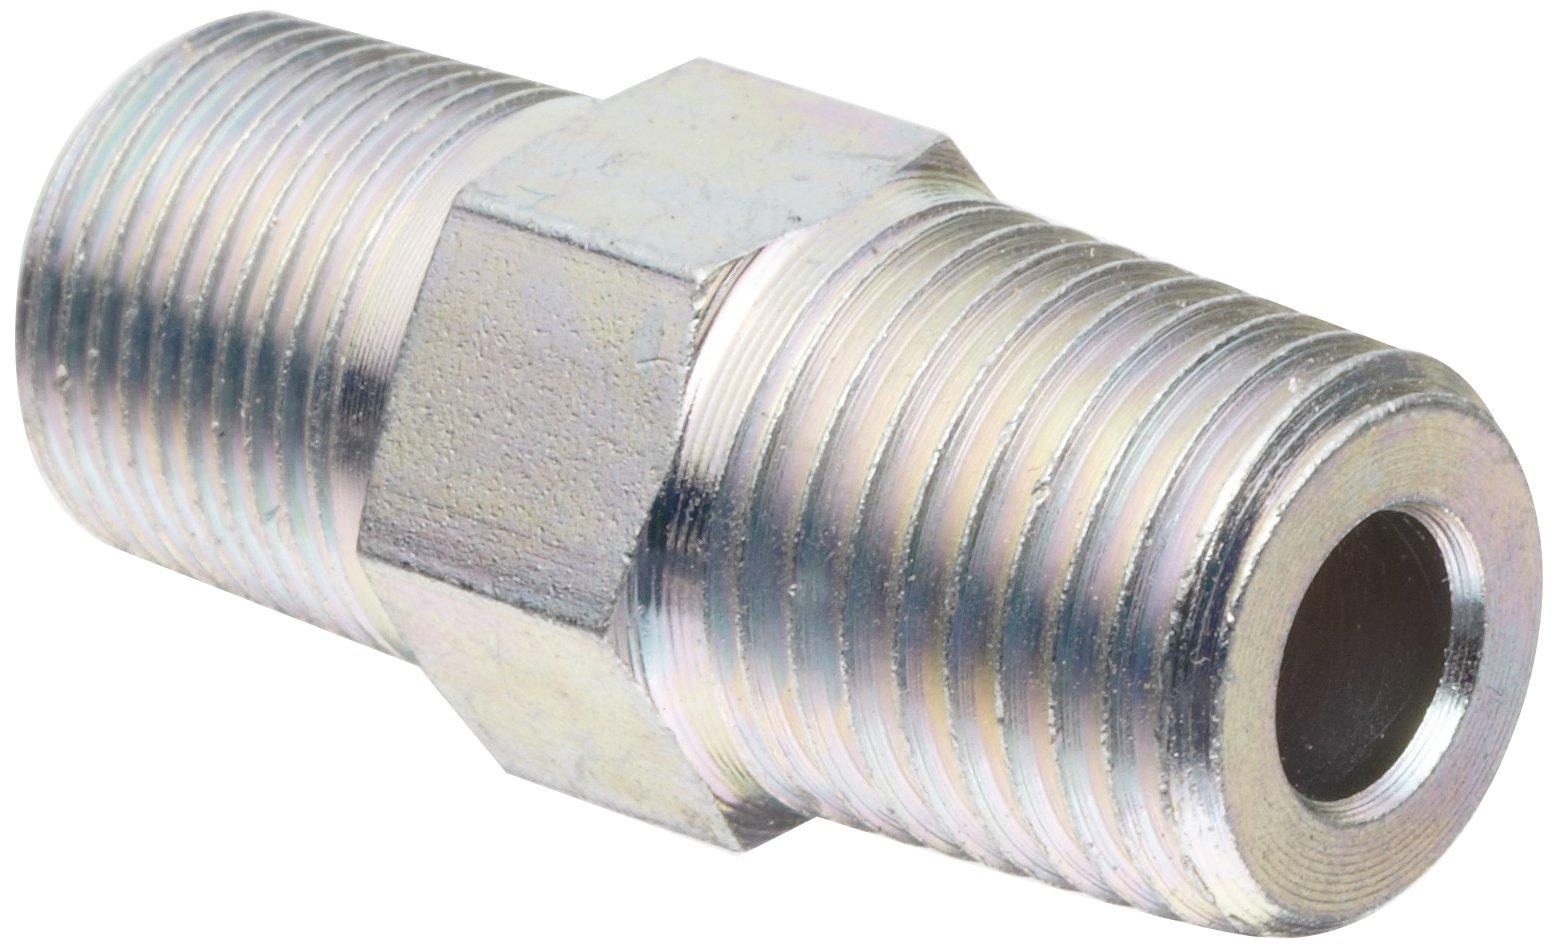 Alemite 43379 Heavy Duty/High Pressure Adapter, Straight, 1/2''-27 Taper Male x 1/4'' Male NPTF